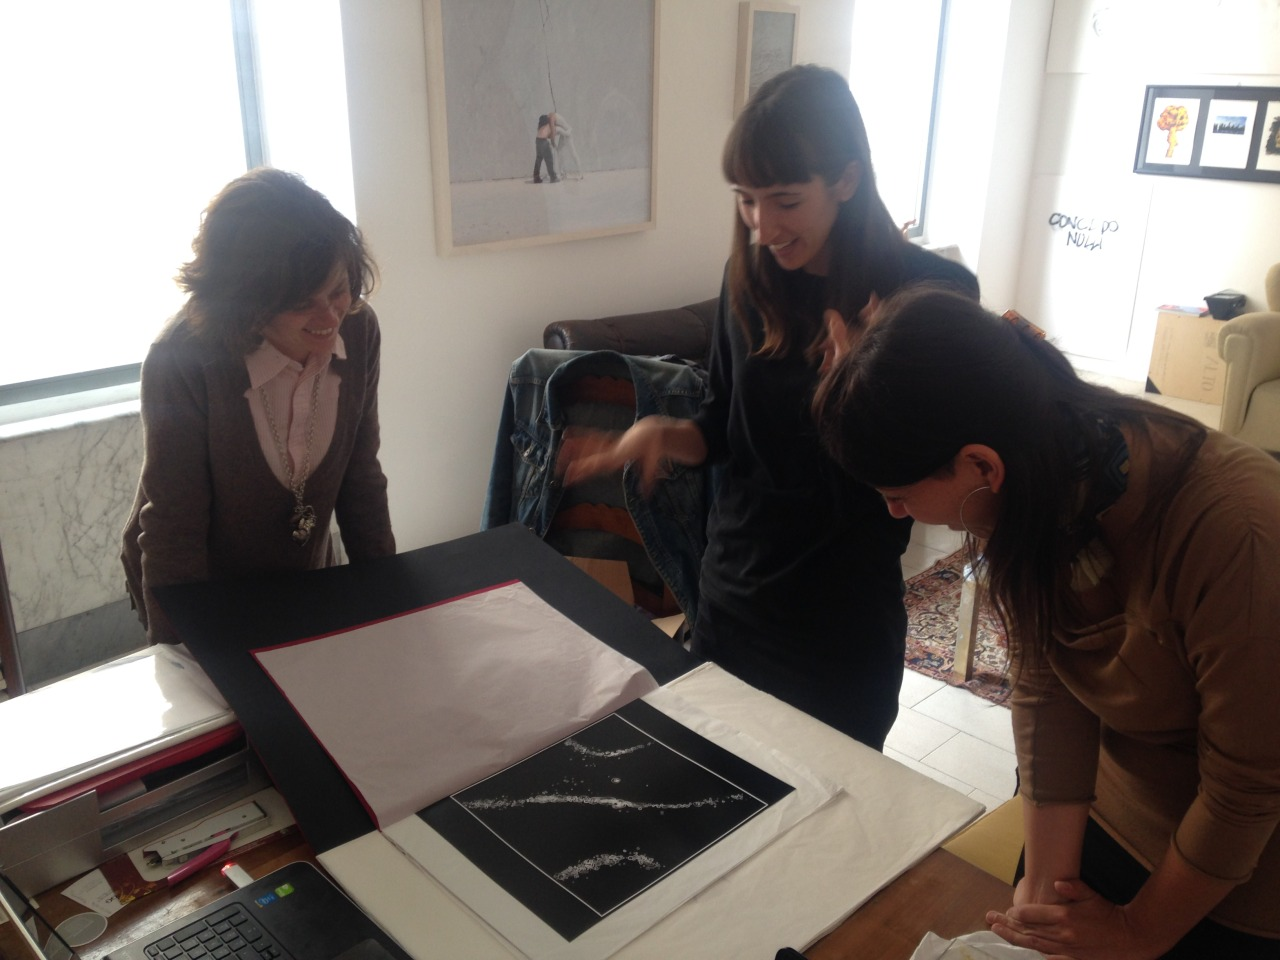 22.05.2015 Alessia Prati studio visit @ DATABASE show room (2) con Carolina Gestri e Stefania Rinaldi